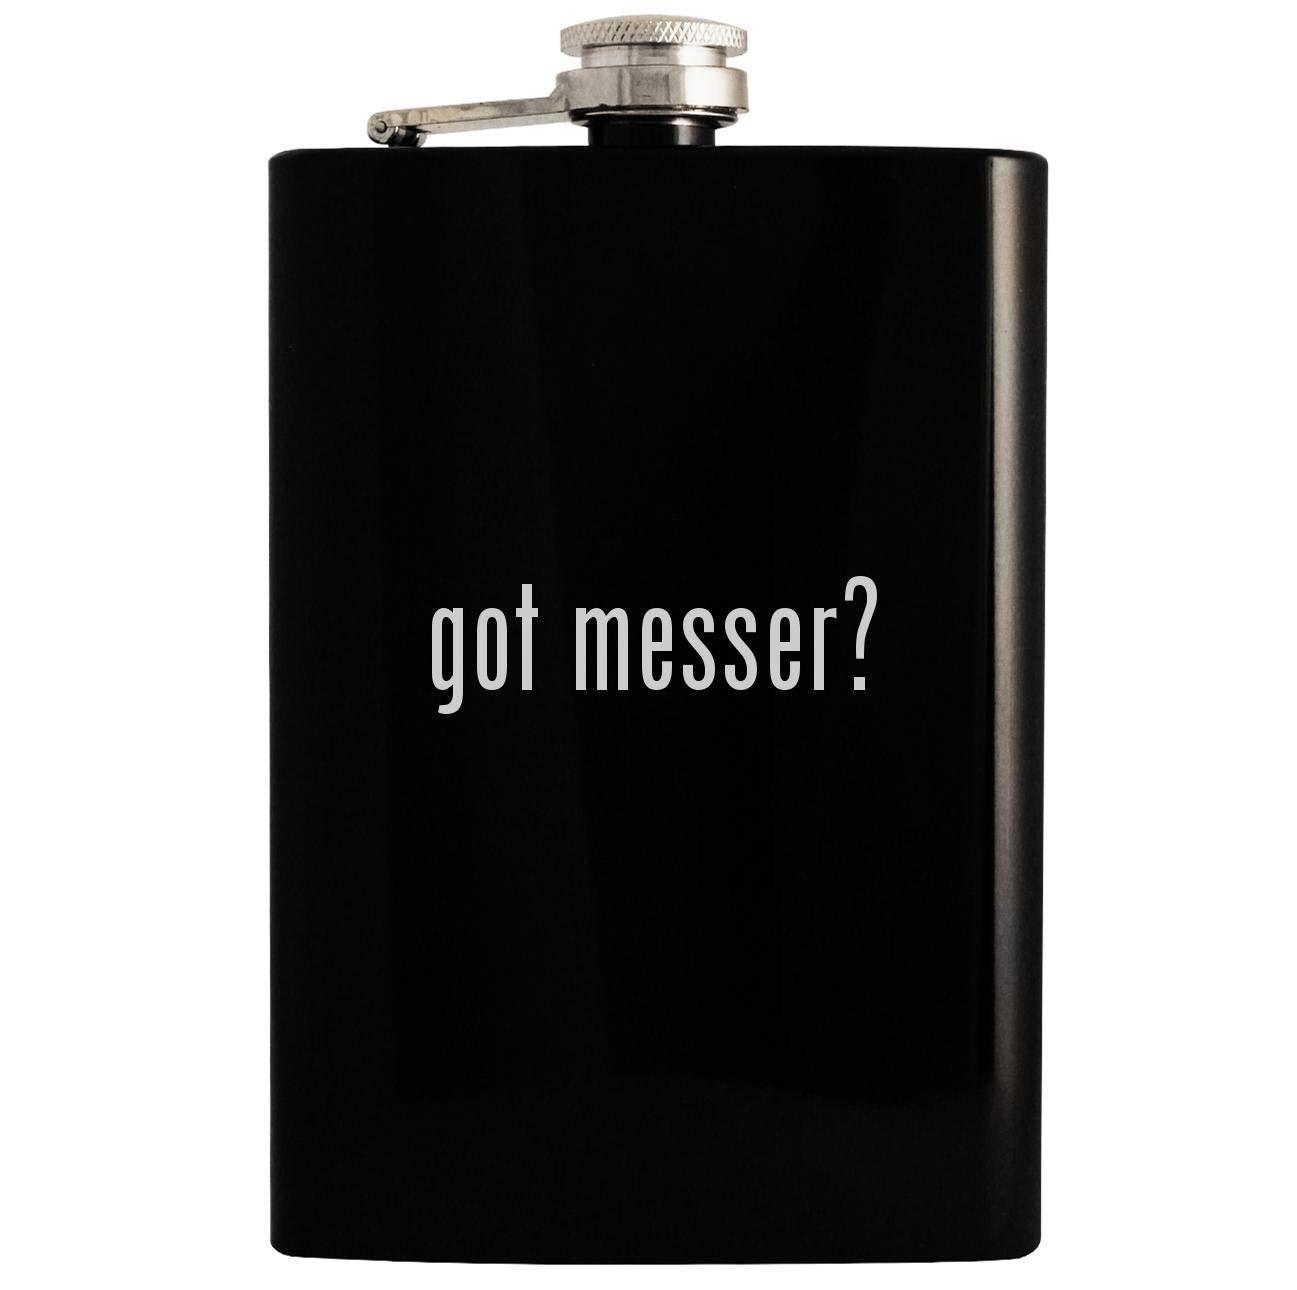 got messer? - 8oz Hip Drinking Alcohol Flask, Black